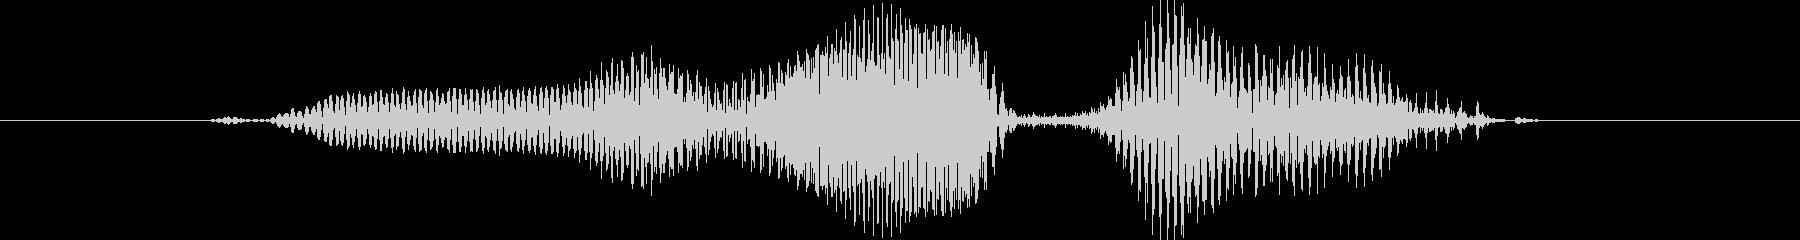 It's hard! (Boys, boys)'s unreproduced waveform